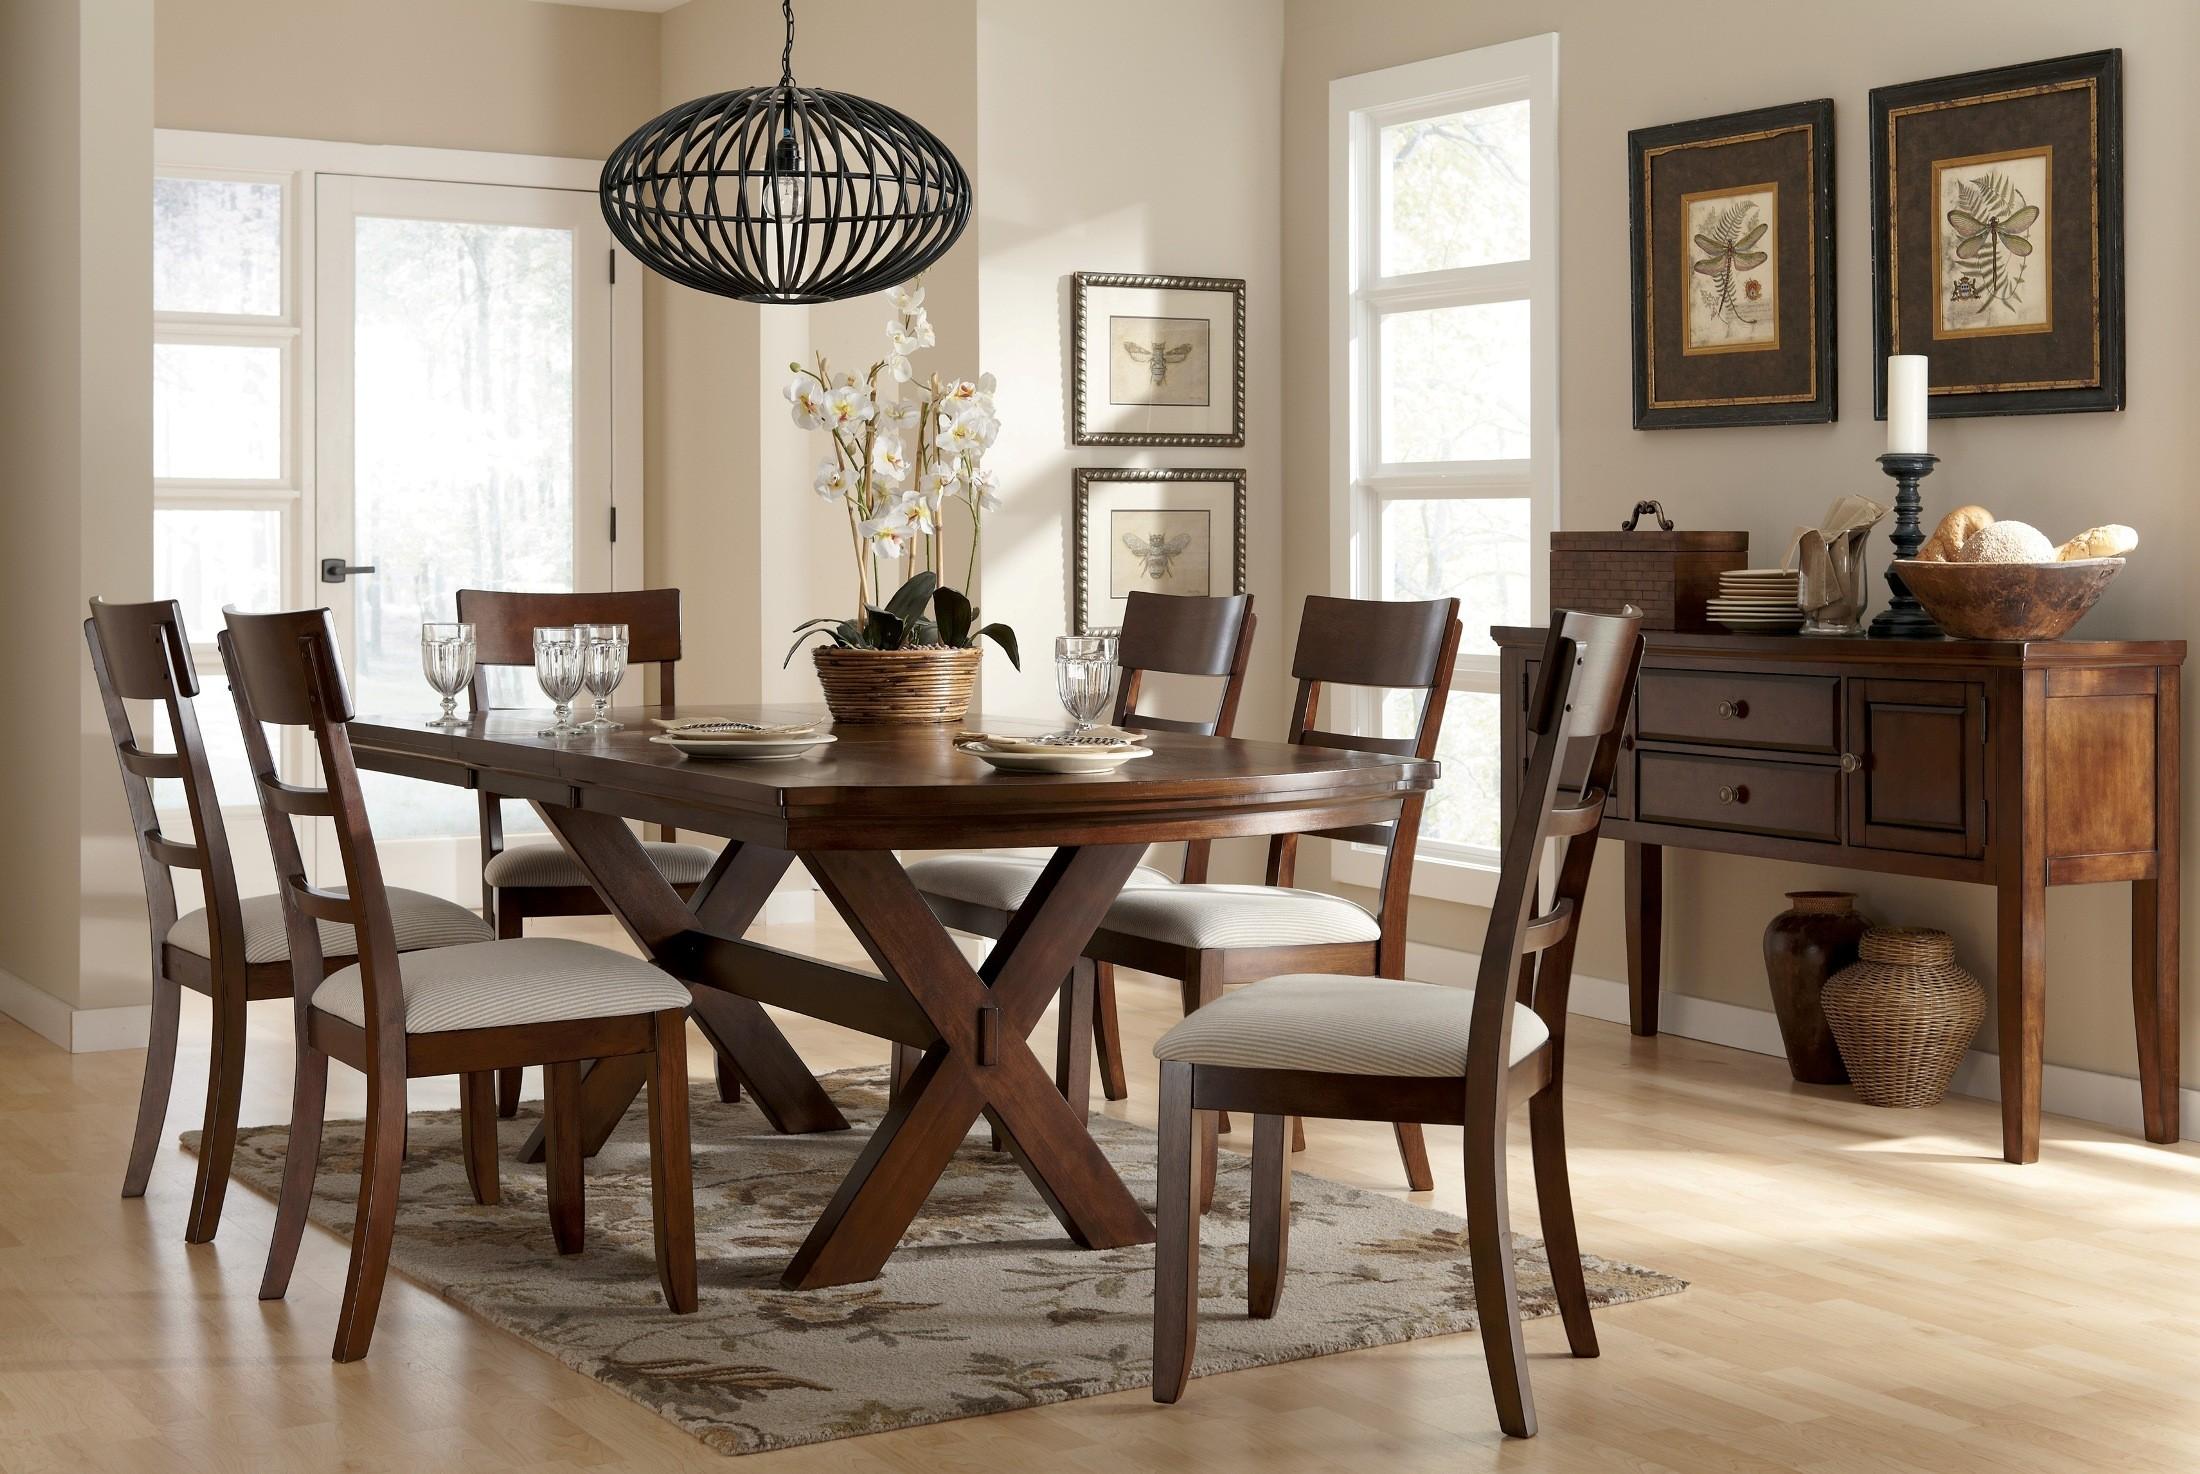 Burkesville Dining Room Set D565 Ashley Furniture